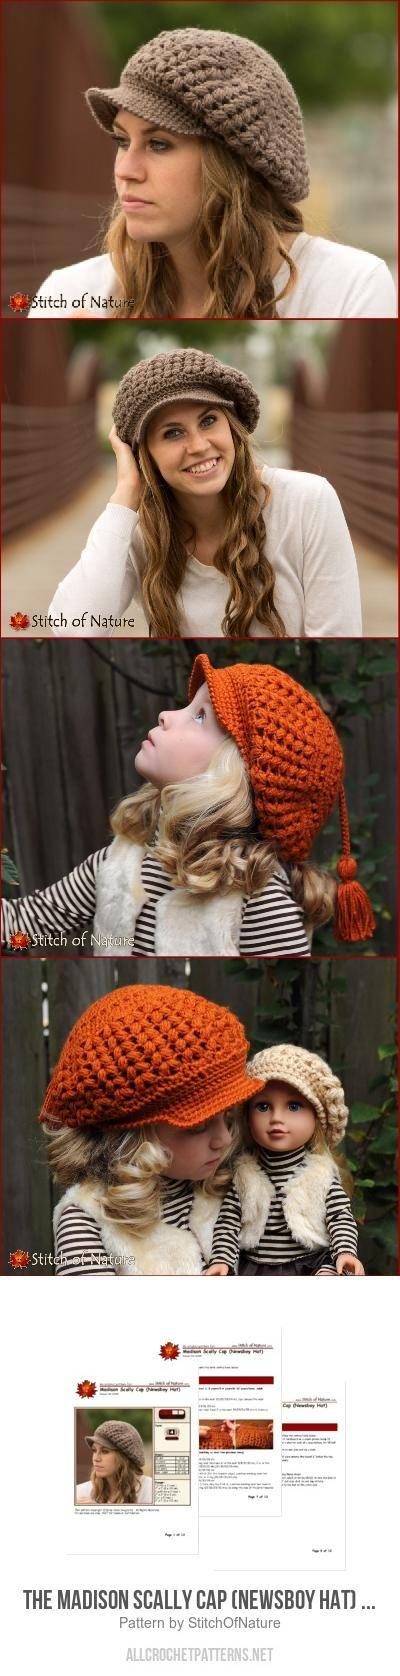 The Madison Scally Cap (Newsboy Hat) for girls crochet pattern